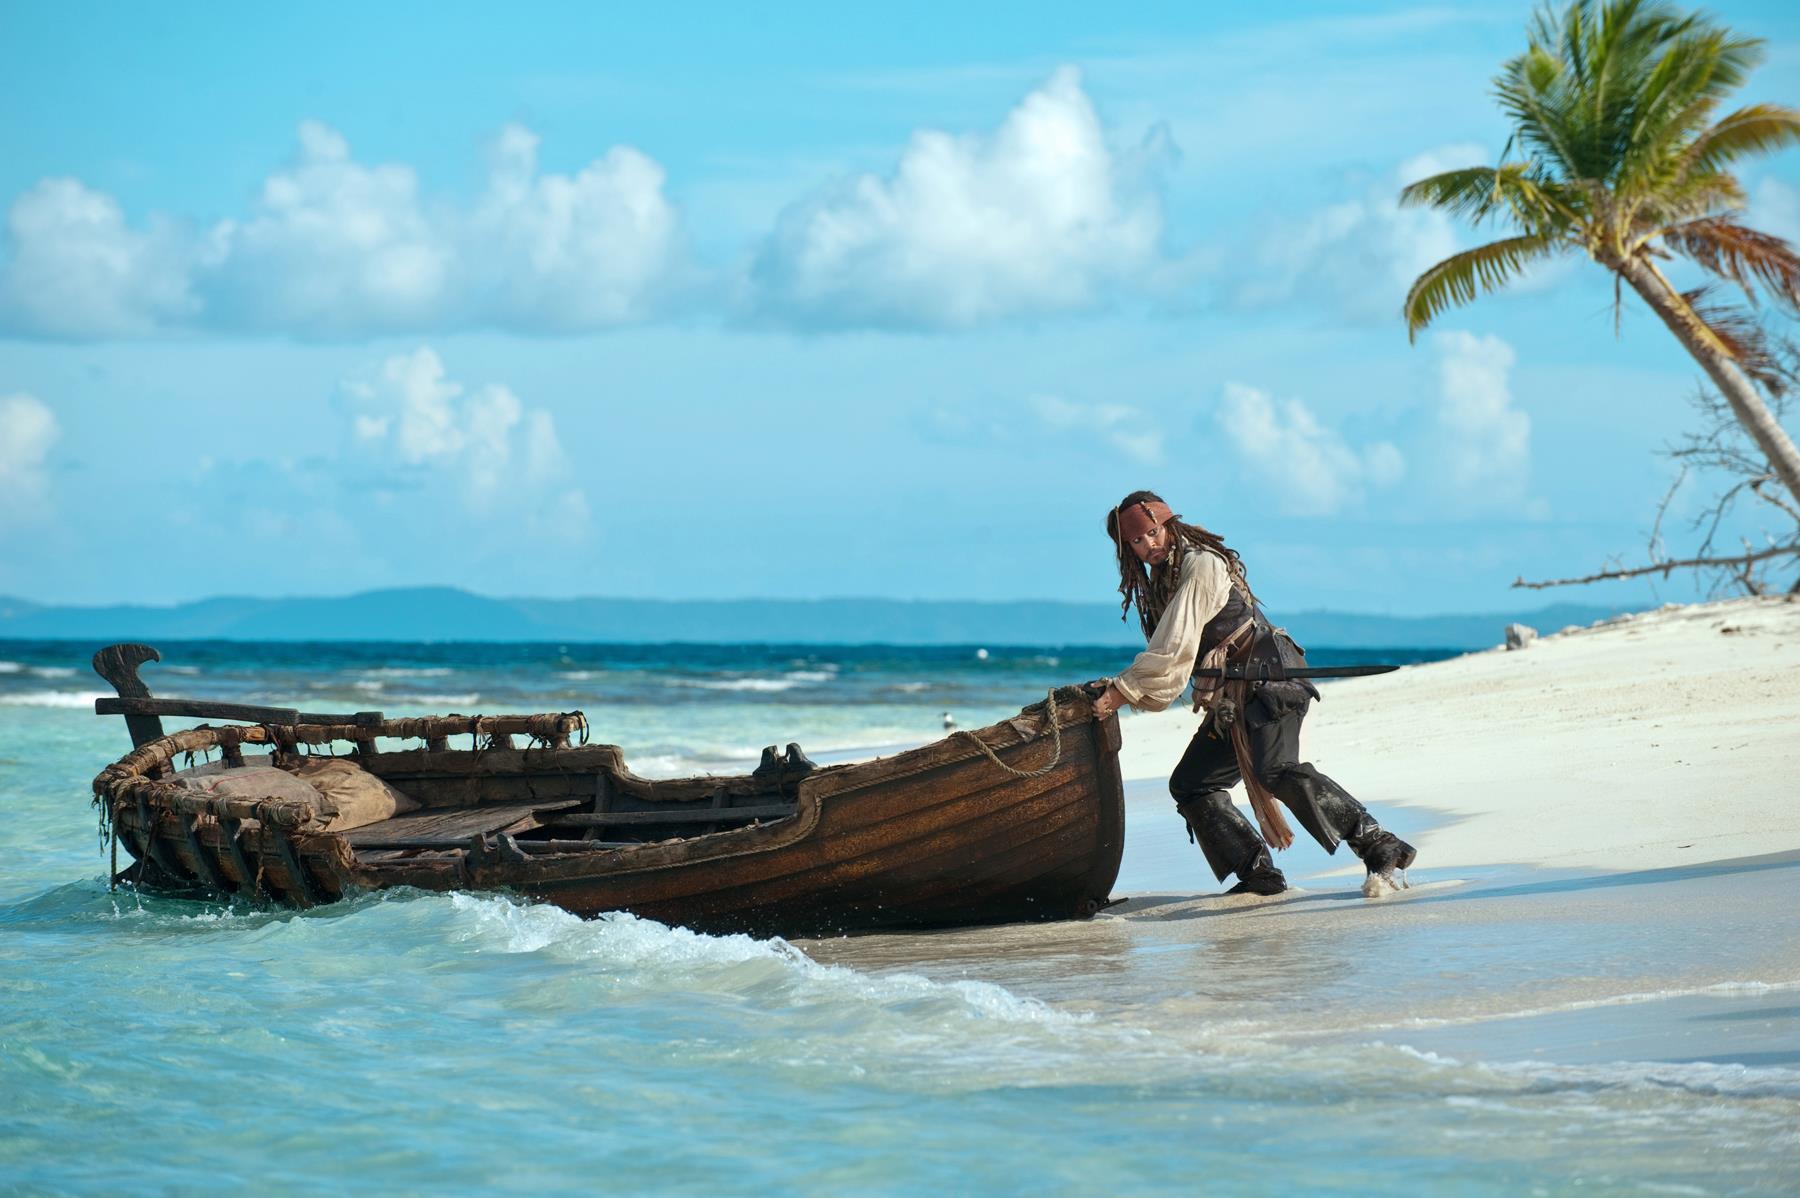 pirati dei caraibi location